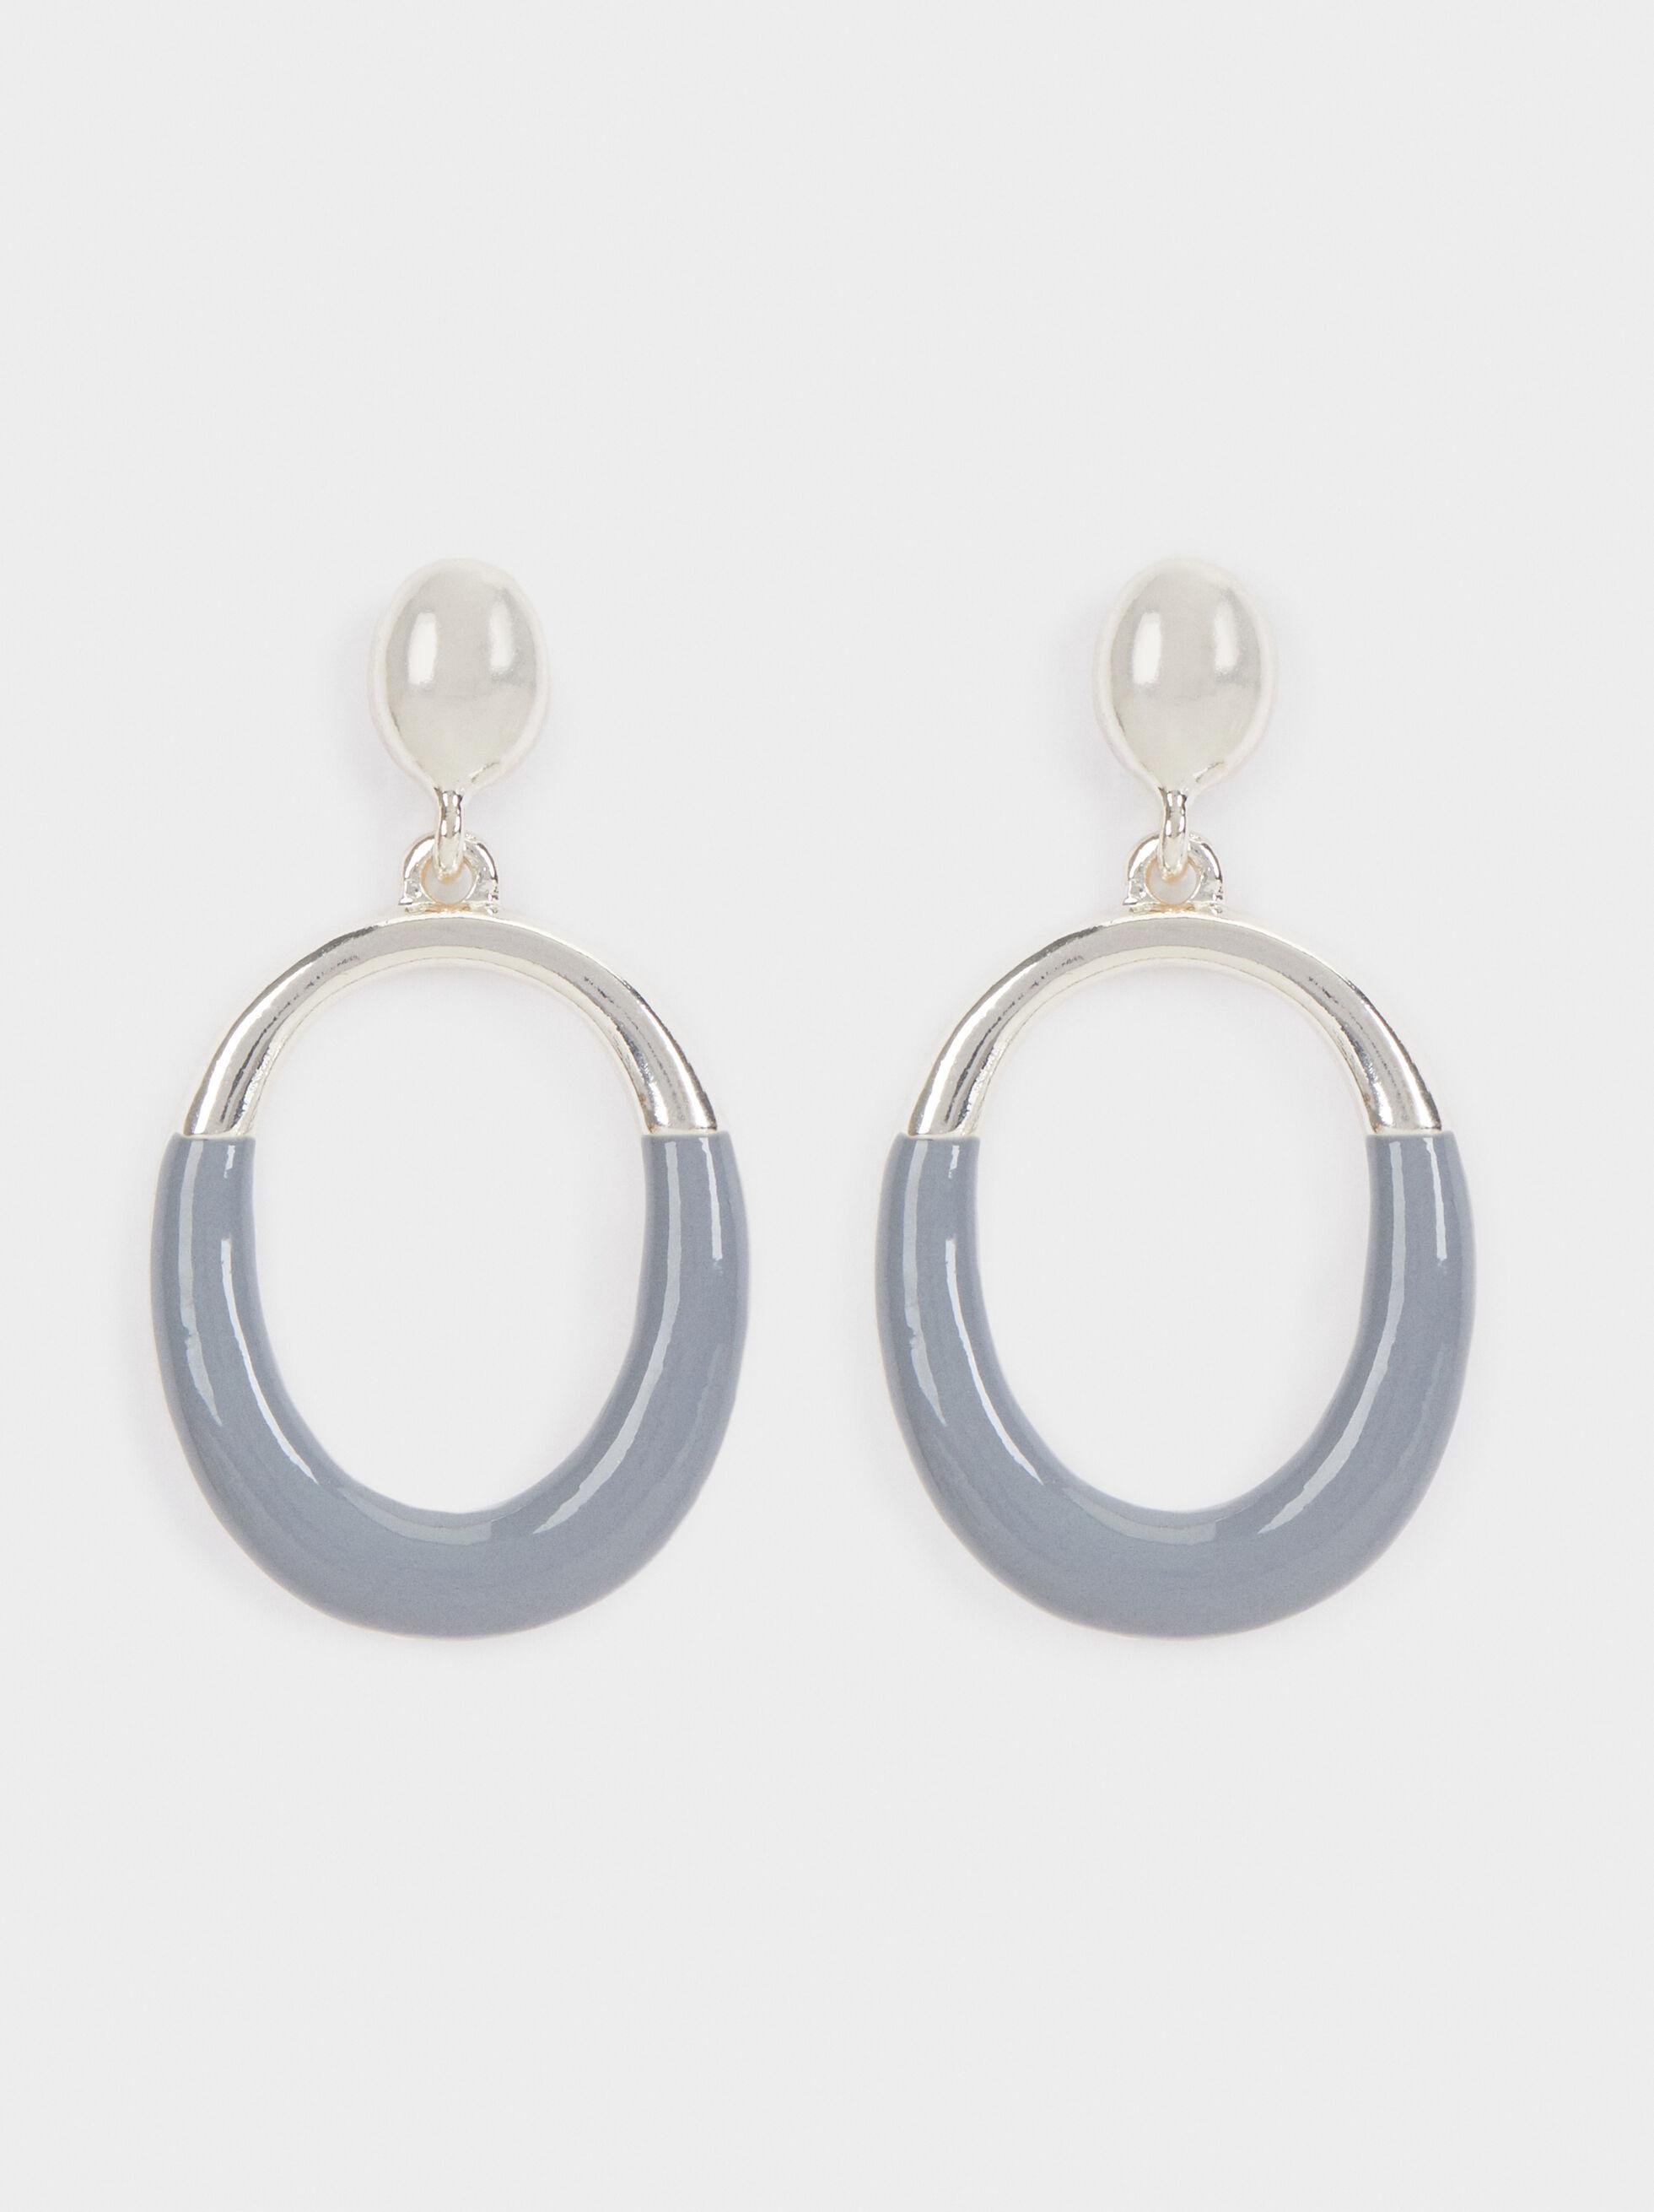 Magnolia Two-Tone Long Earrings, Multicolor, hi-res